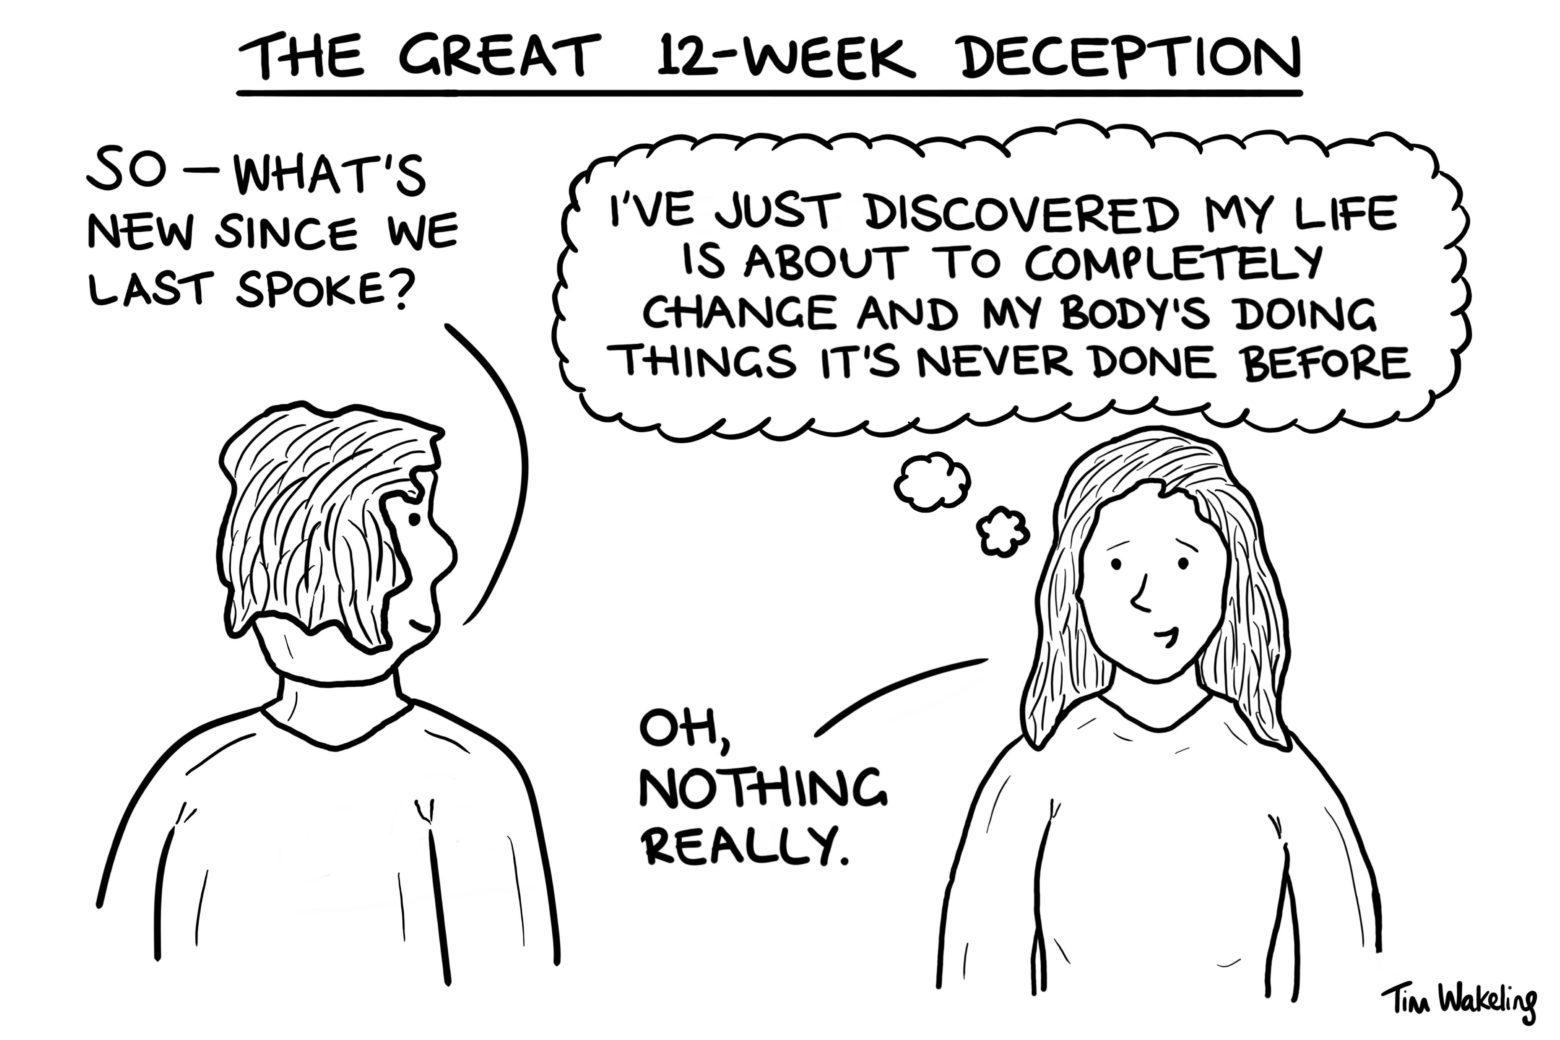 The Great 12-Week Deception